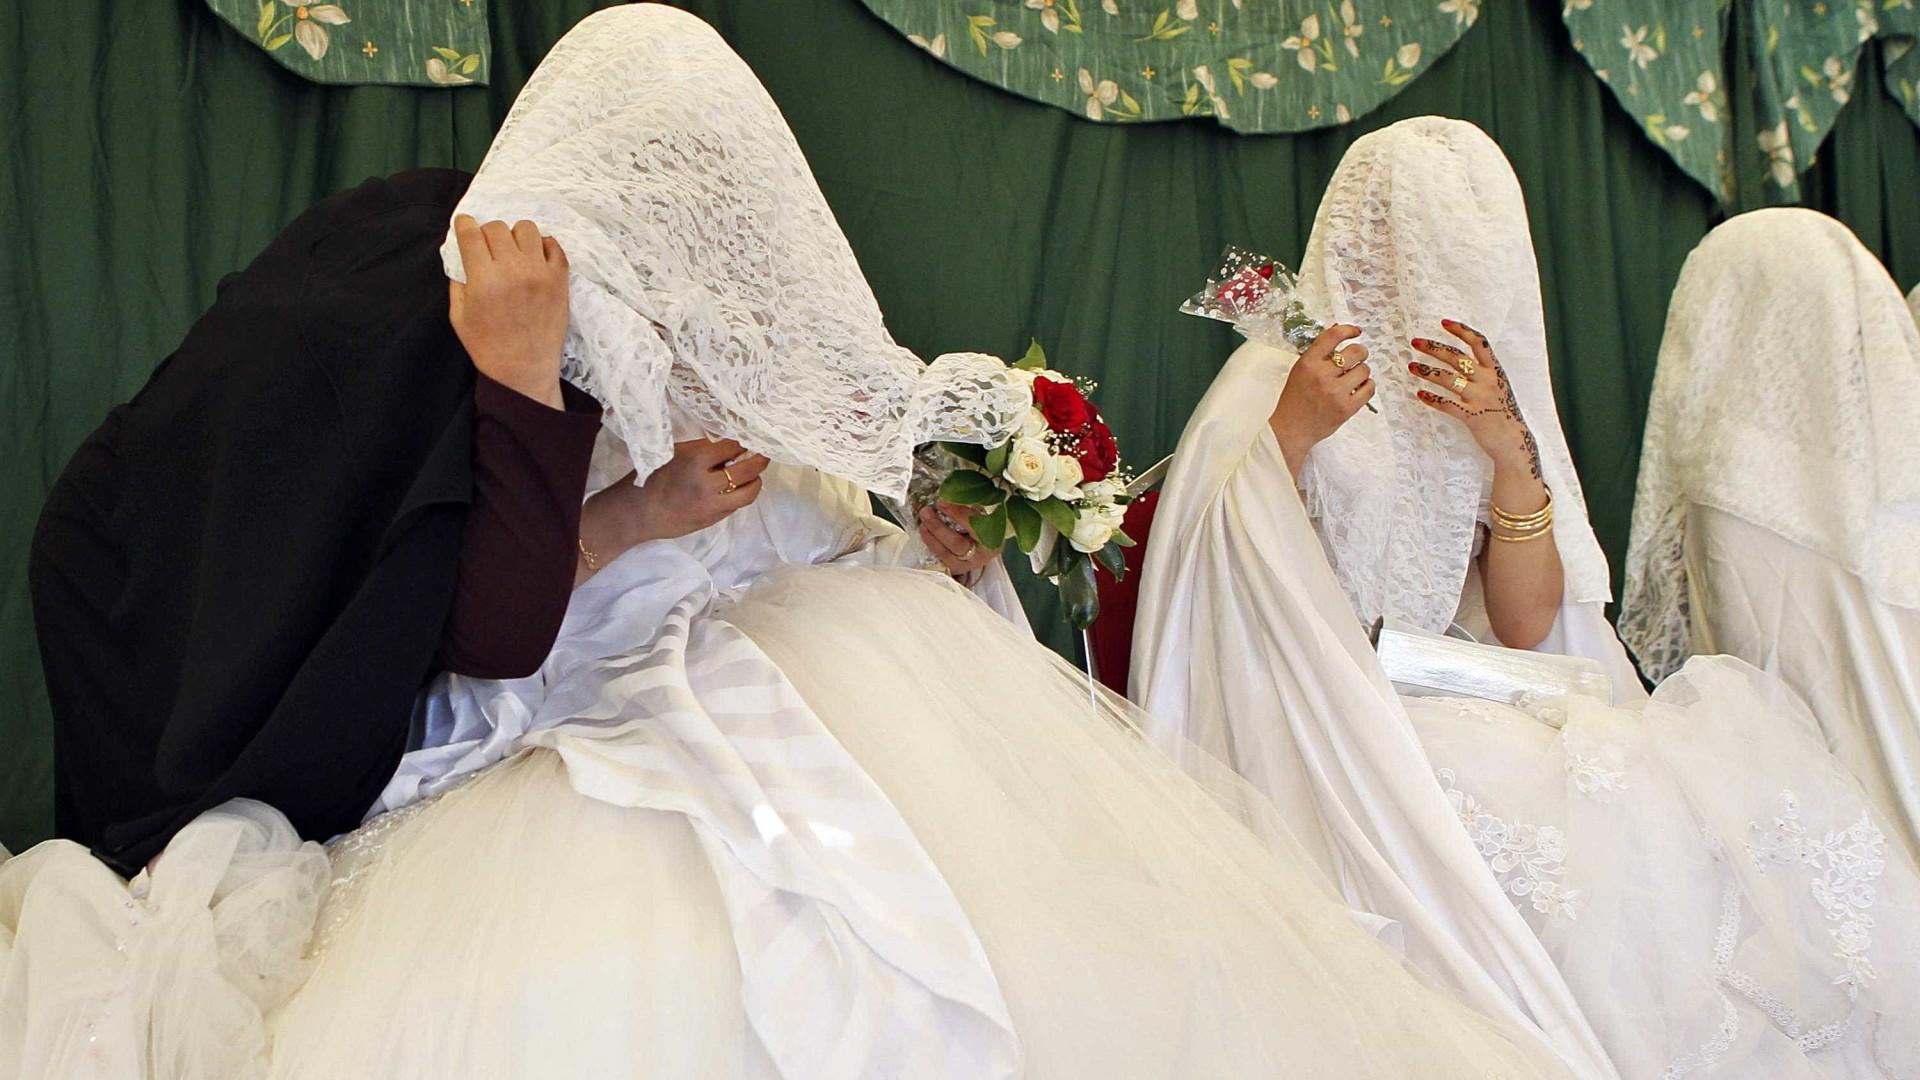 Grupo armado quer impor casamento entre muçulmanos e cristãos